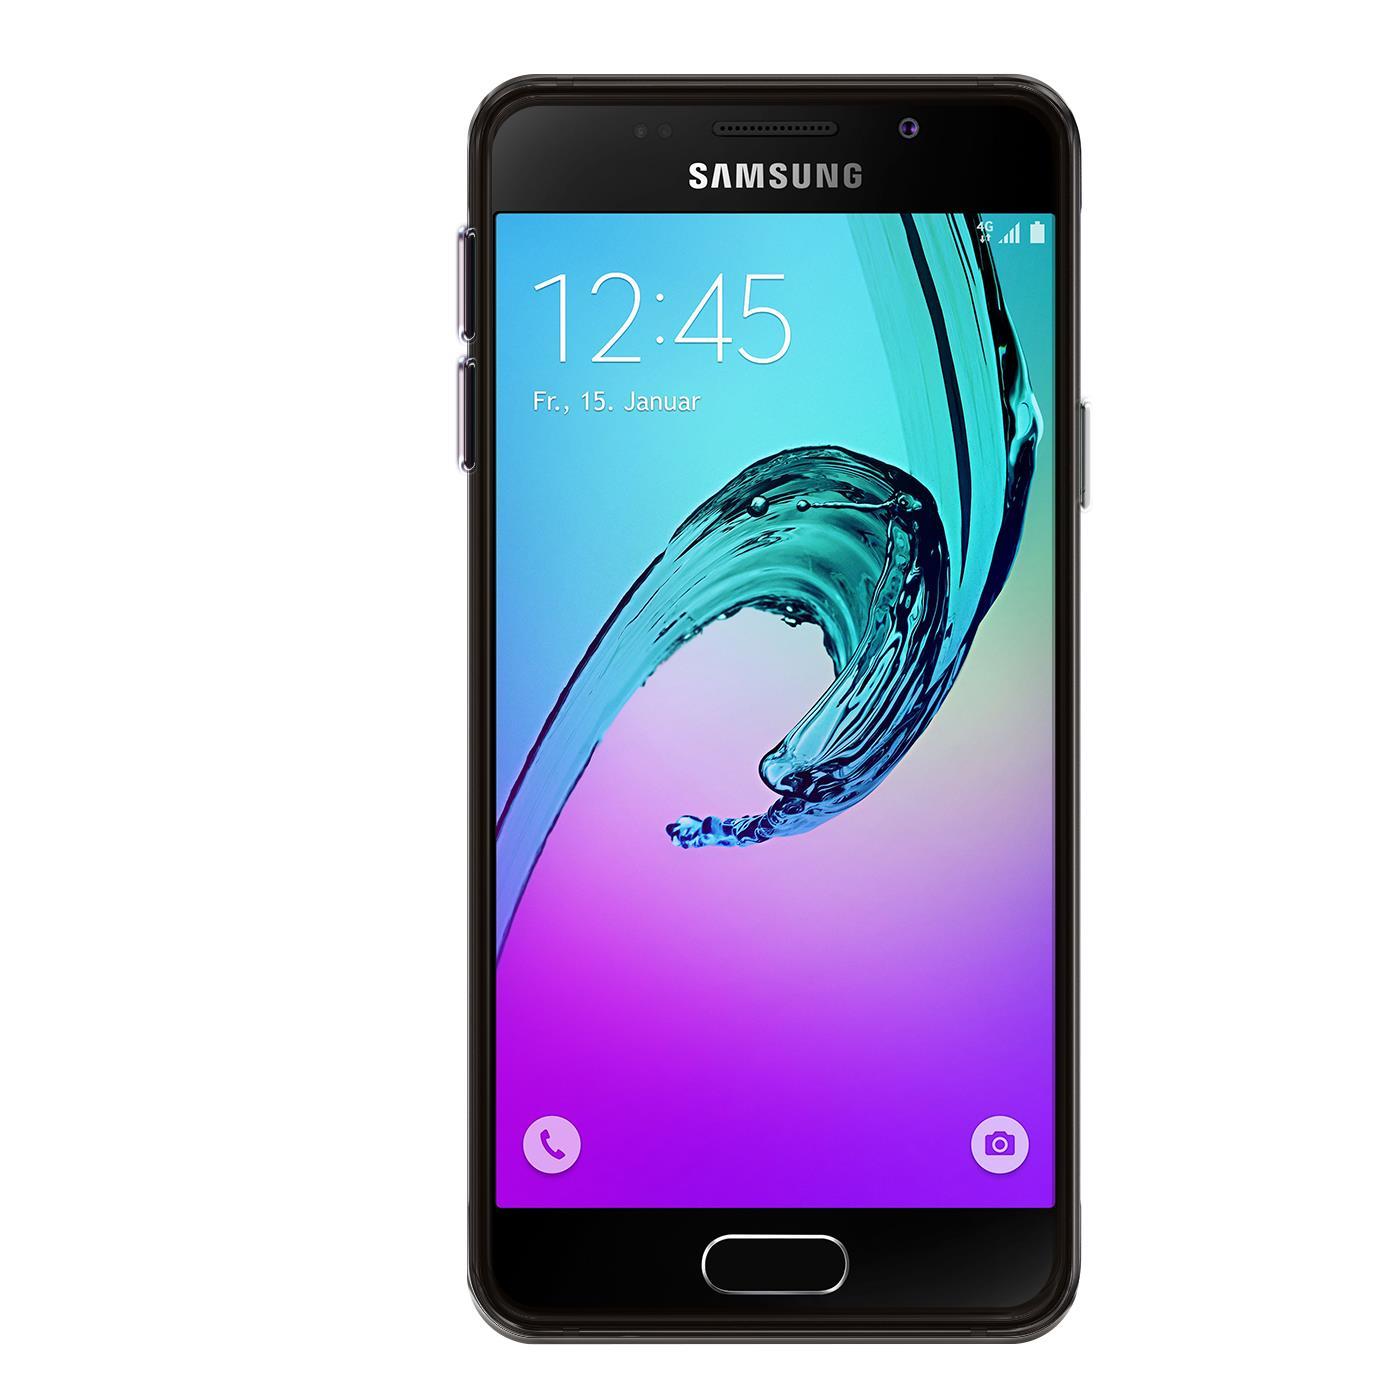 Samsung-Galaxy-a3-2016-Thin-Silikon-Klar-Case-Cover-Ultra-Slim-Stossfeste-Gel Indexbild 29